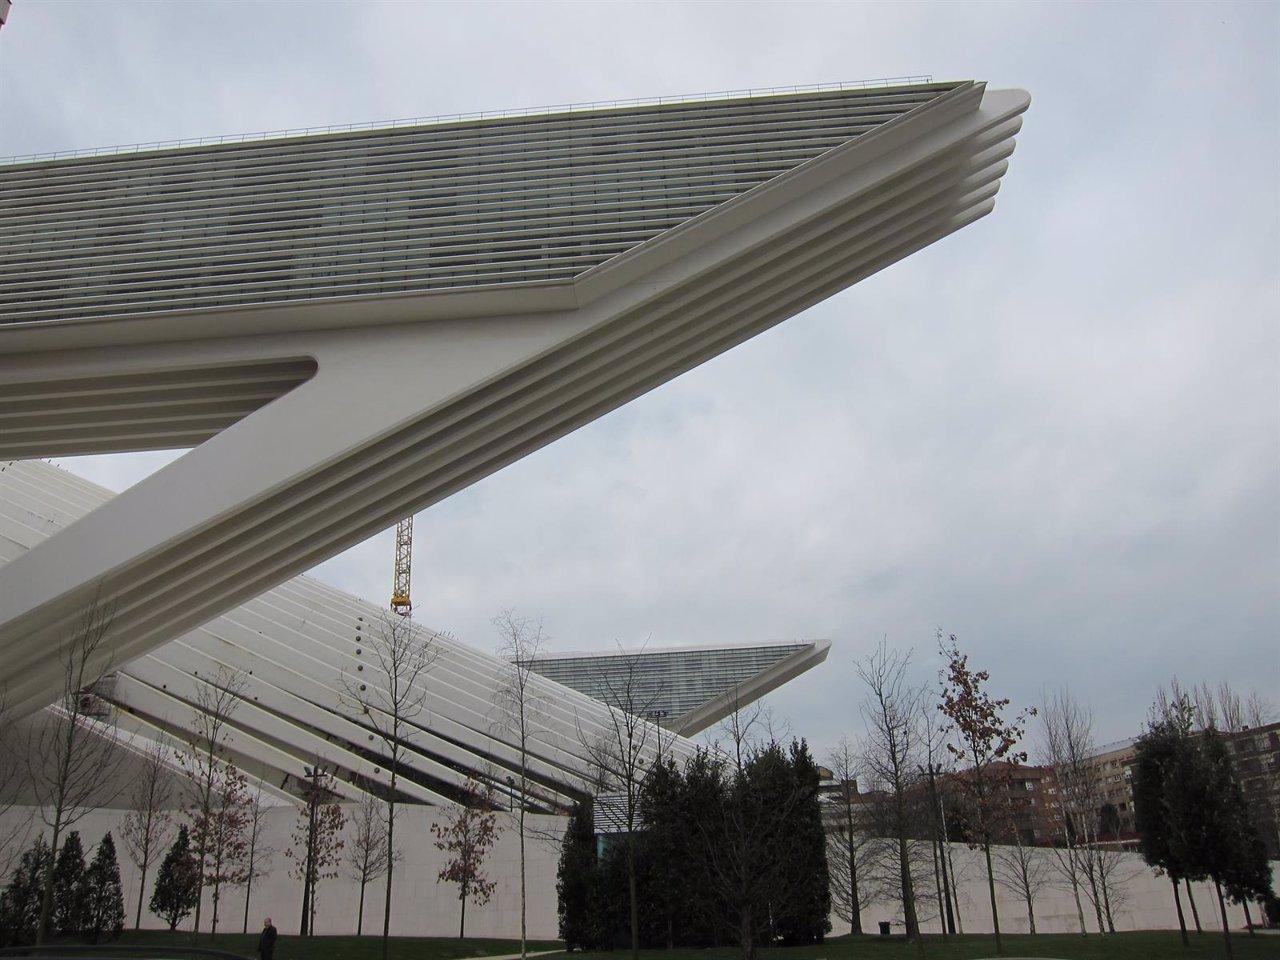 Edificio de Calatrava de Oviedo